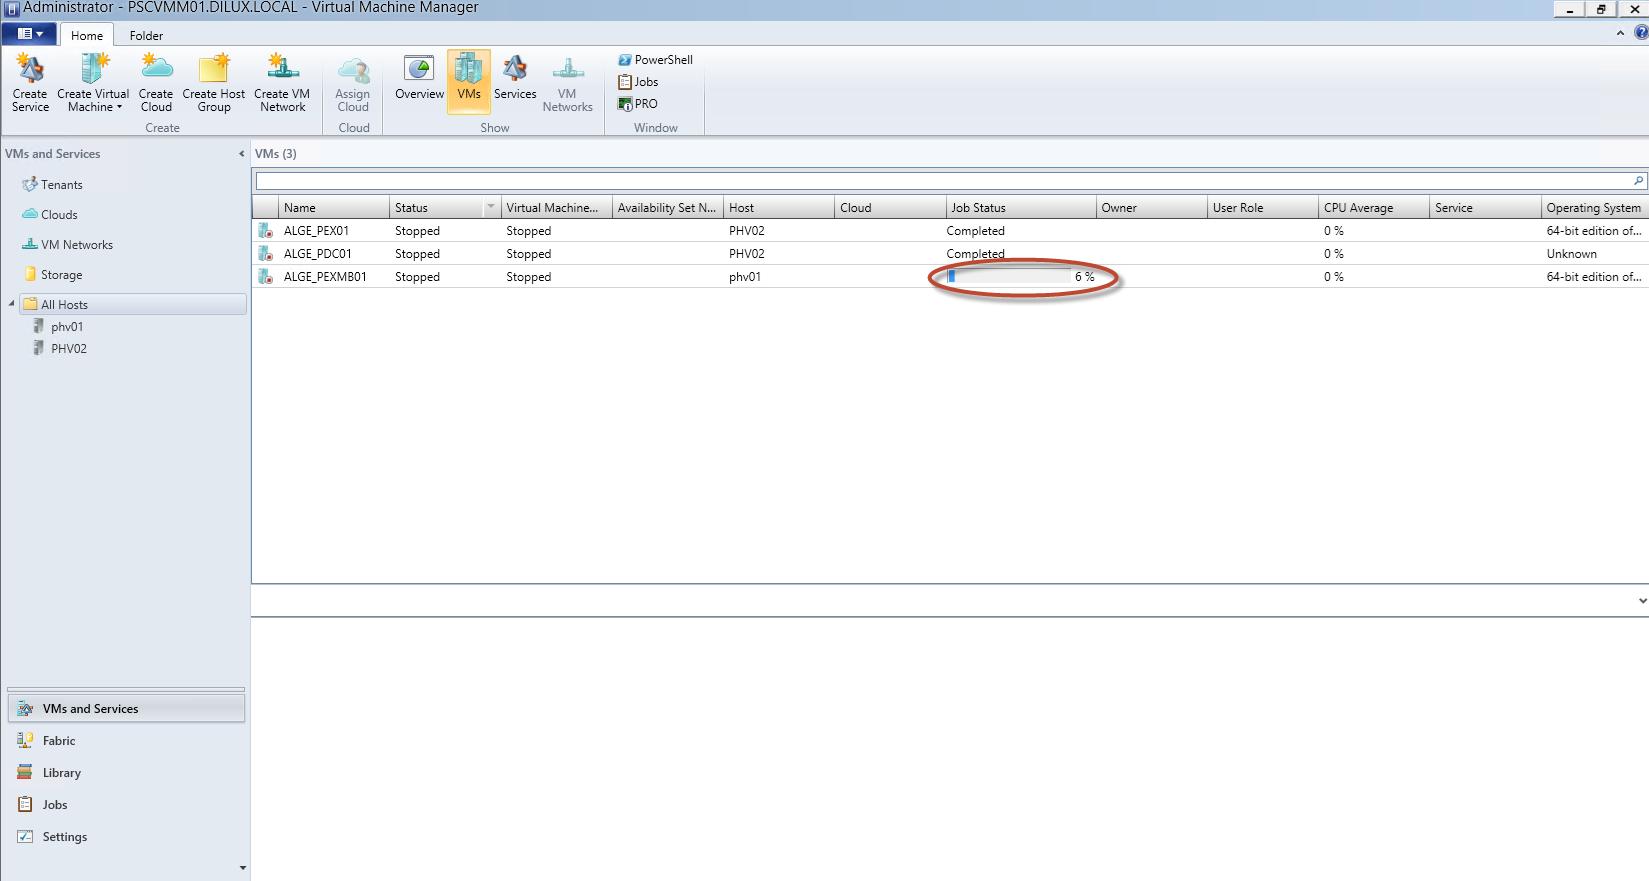 Configuración de System Center Virtual Machine Manager 2012 SP1 - Migración de Equipos Virtuales